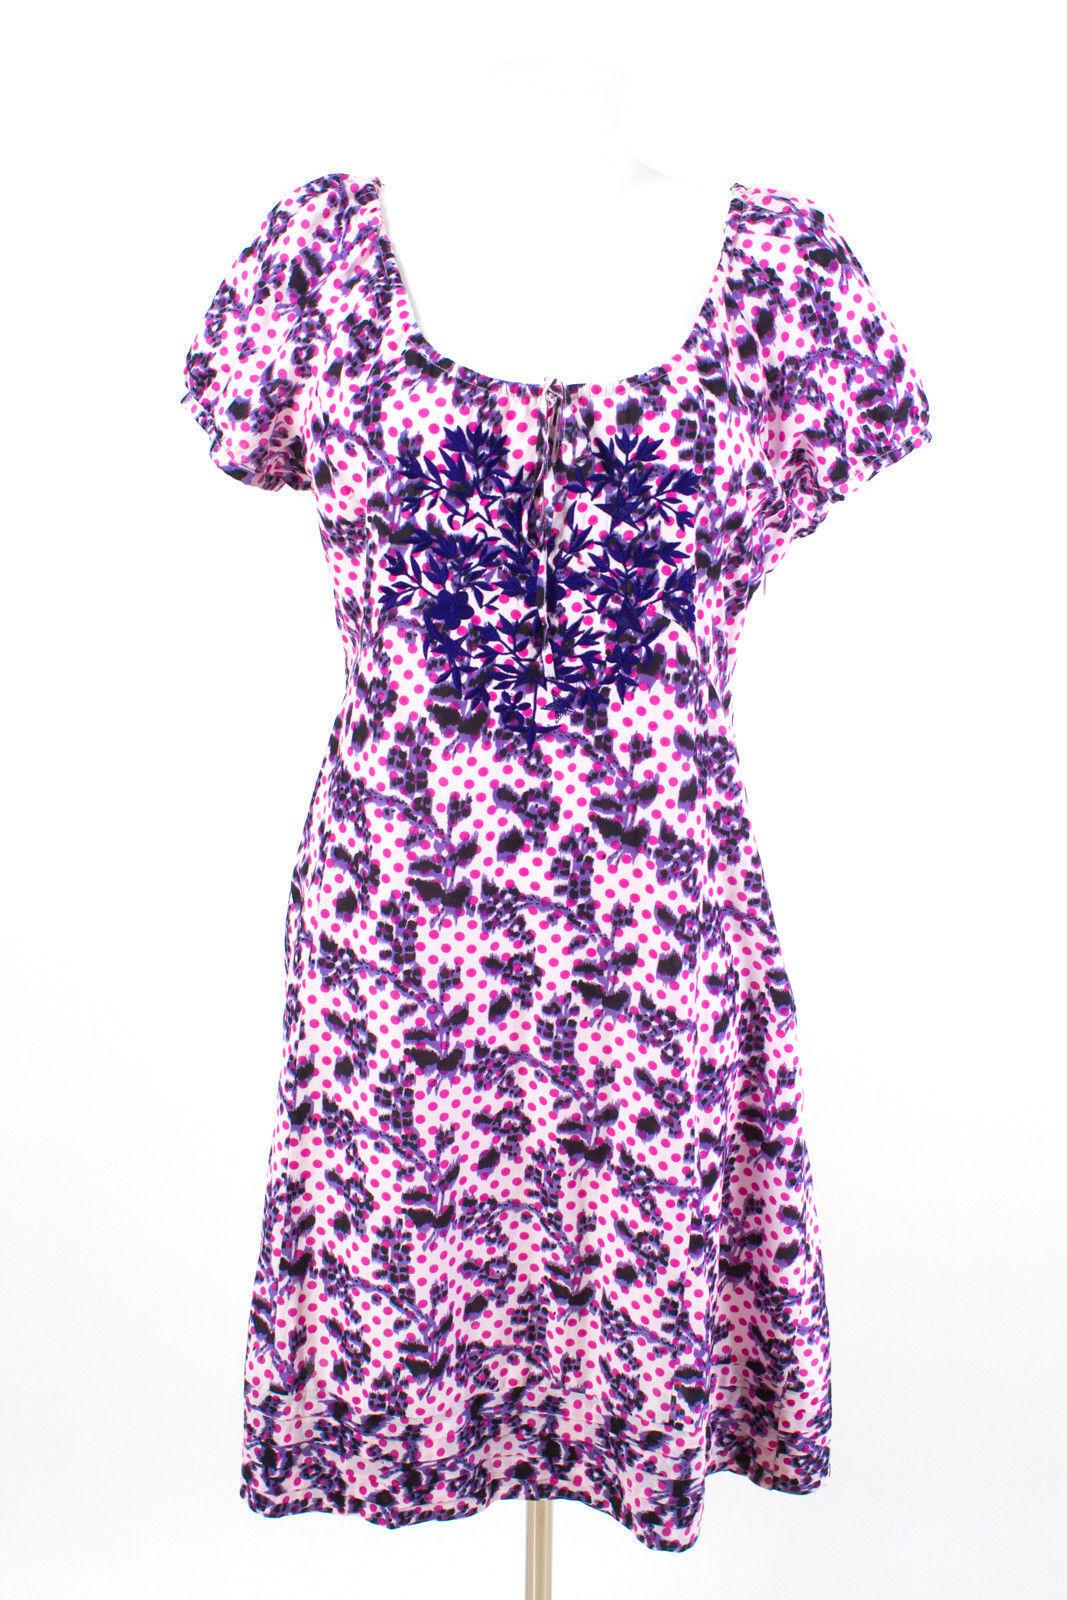 Paisley Park Kleid Gr. 2XL   44 Baumwolle-Seide-Mix A-Linie Sommerkleid Dress